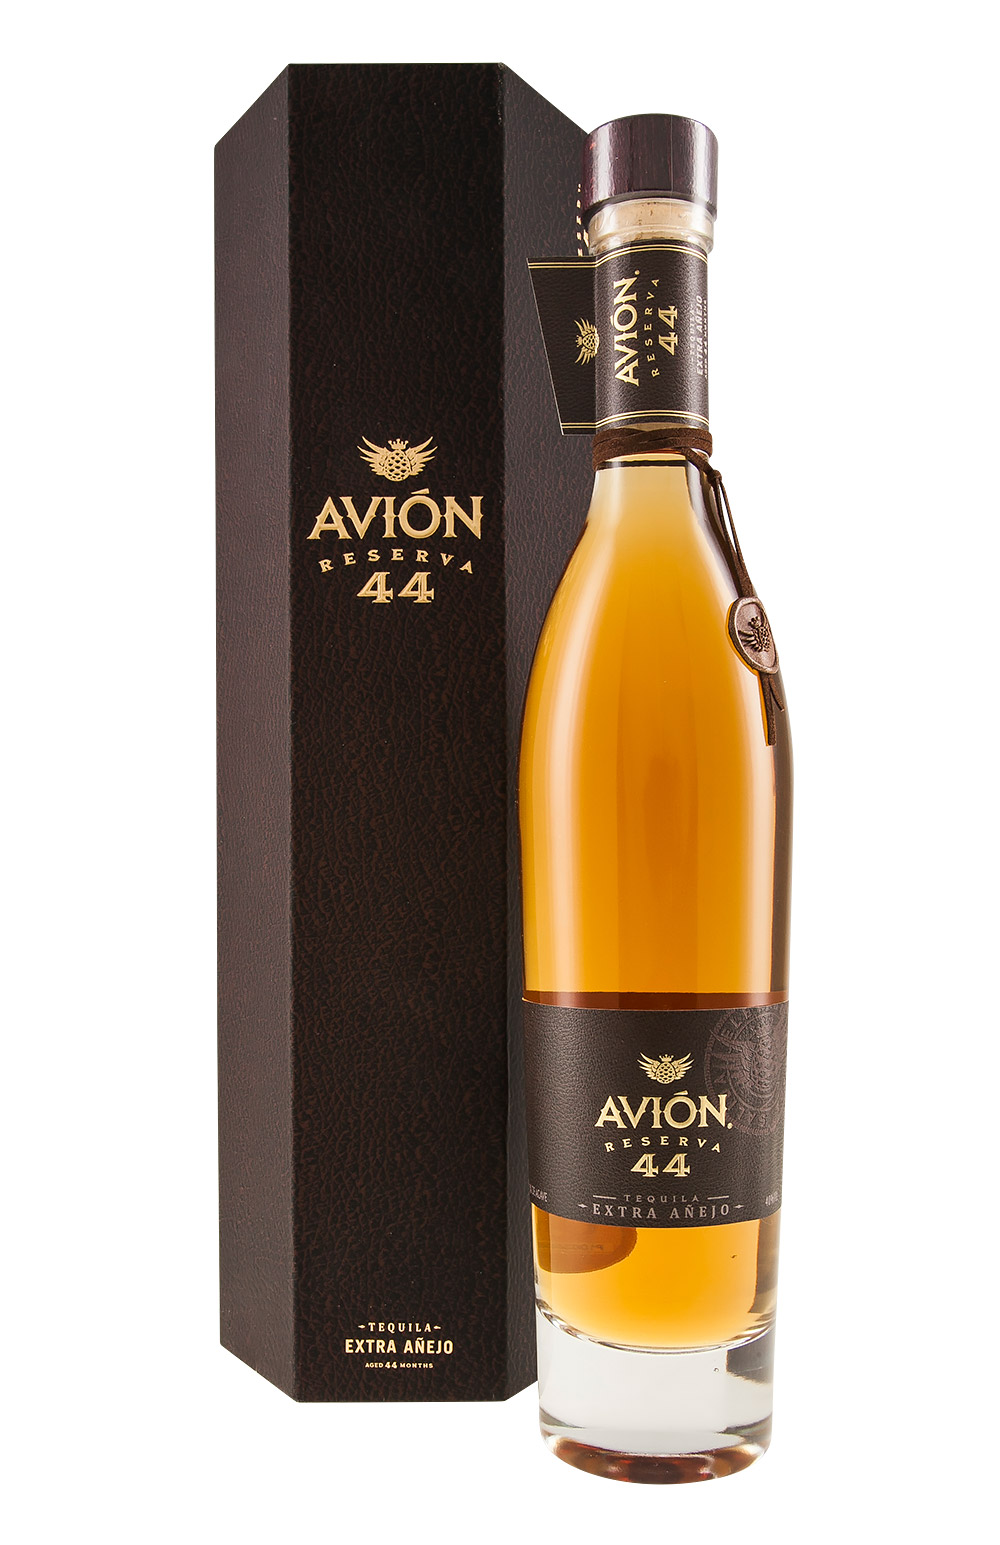 Avion Reserva 44 Hedonism Wines